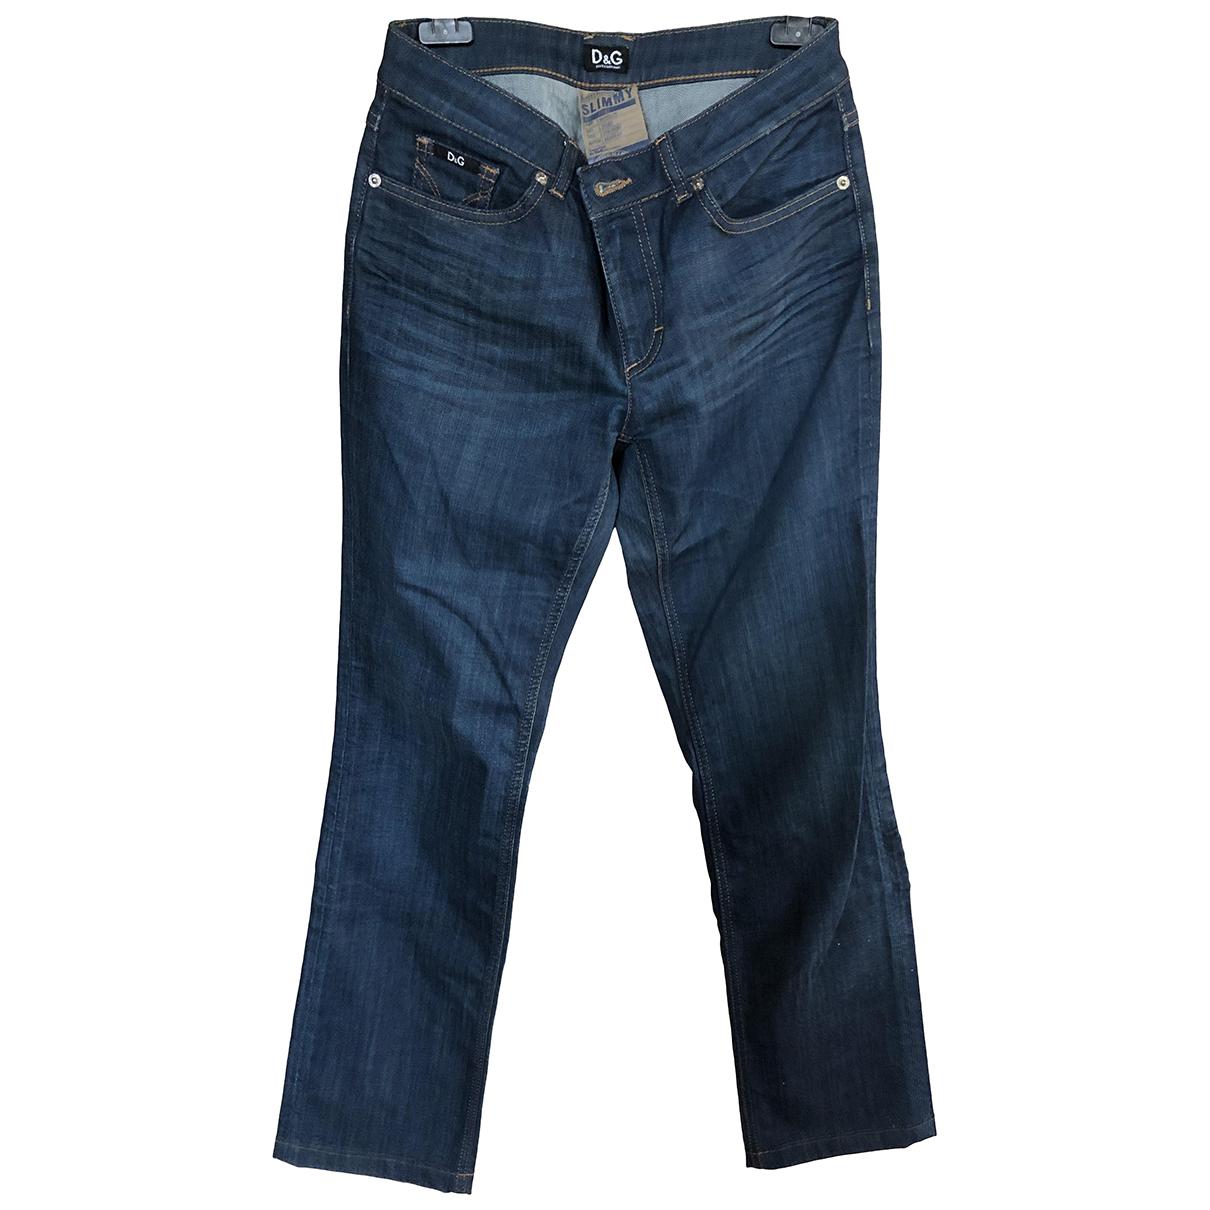 Dolce & Gabbana N Blue Denim - Jeans Jeans for Women 28 US